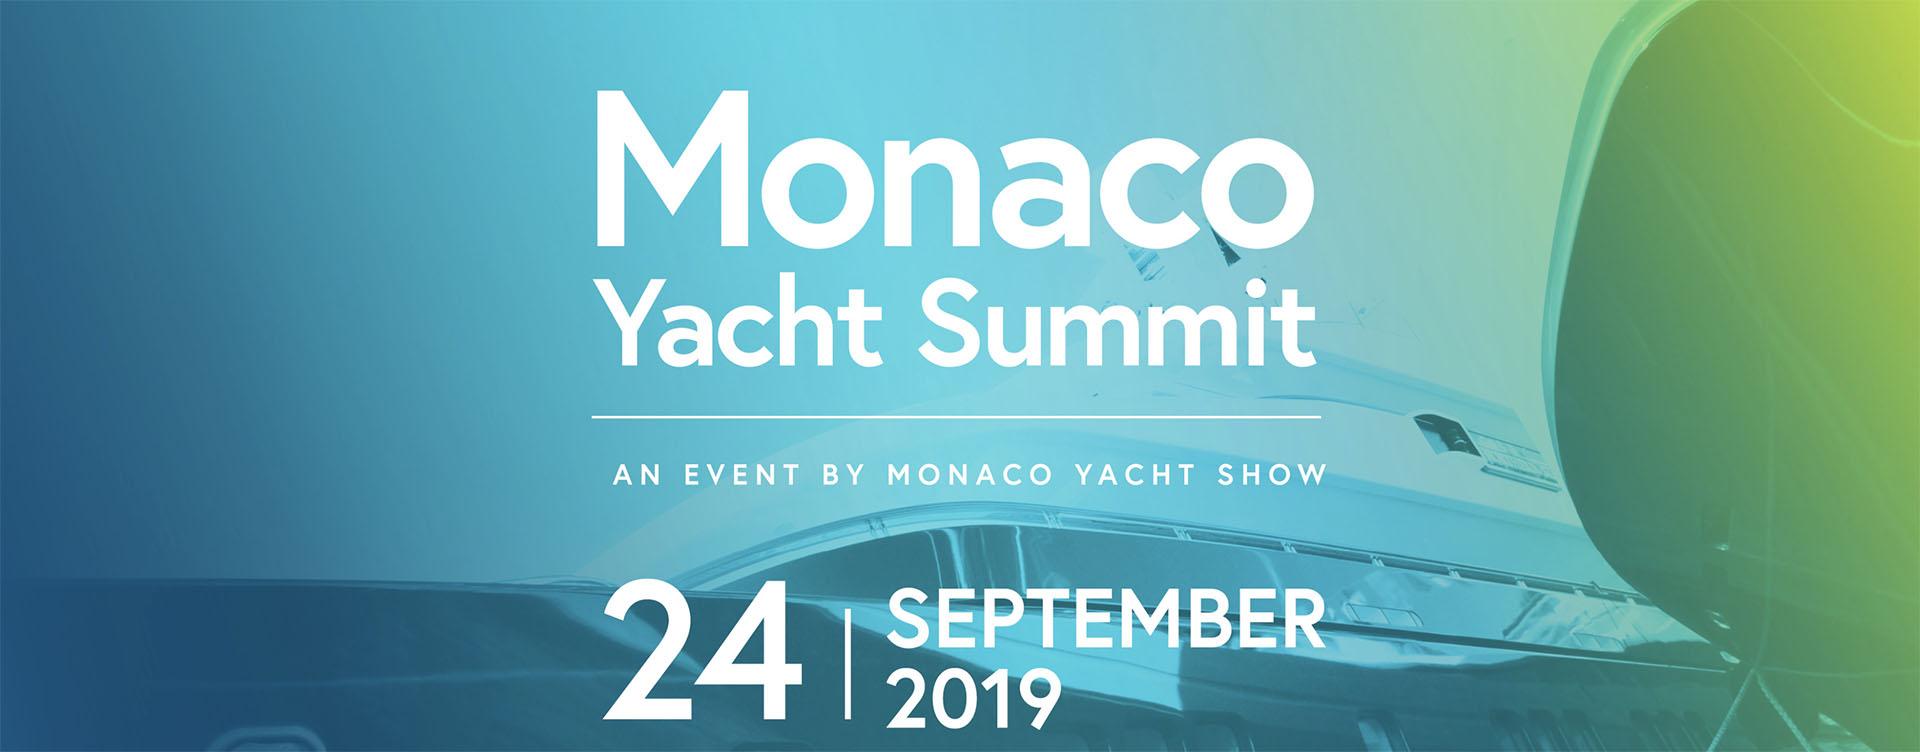 Monaco Yacht Summit